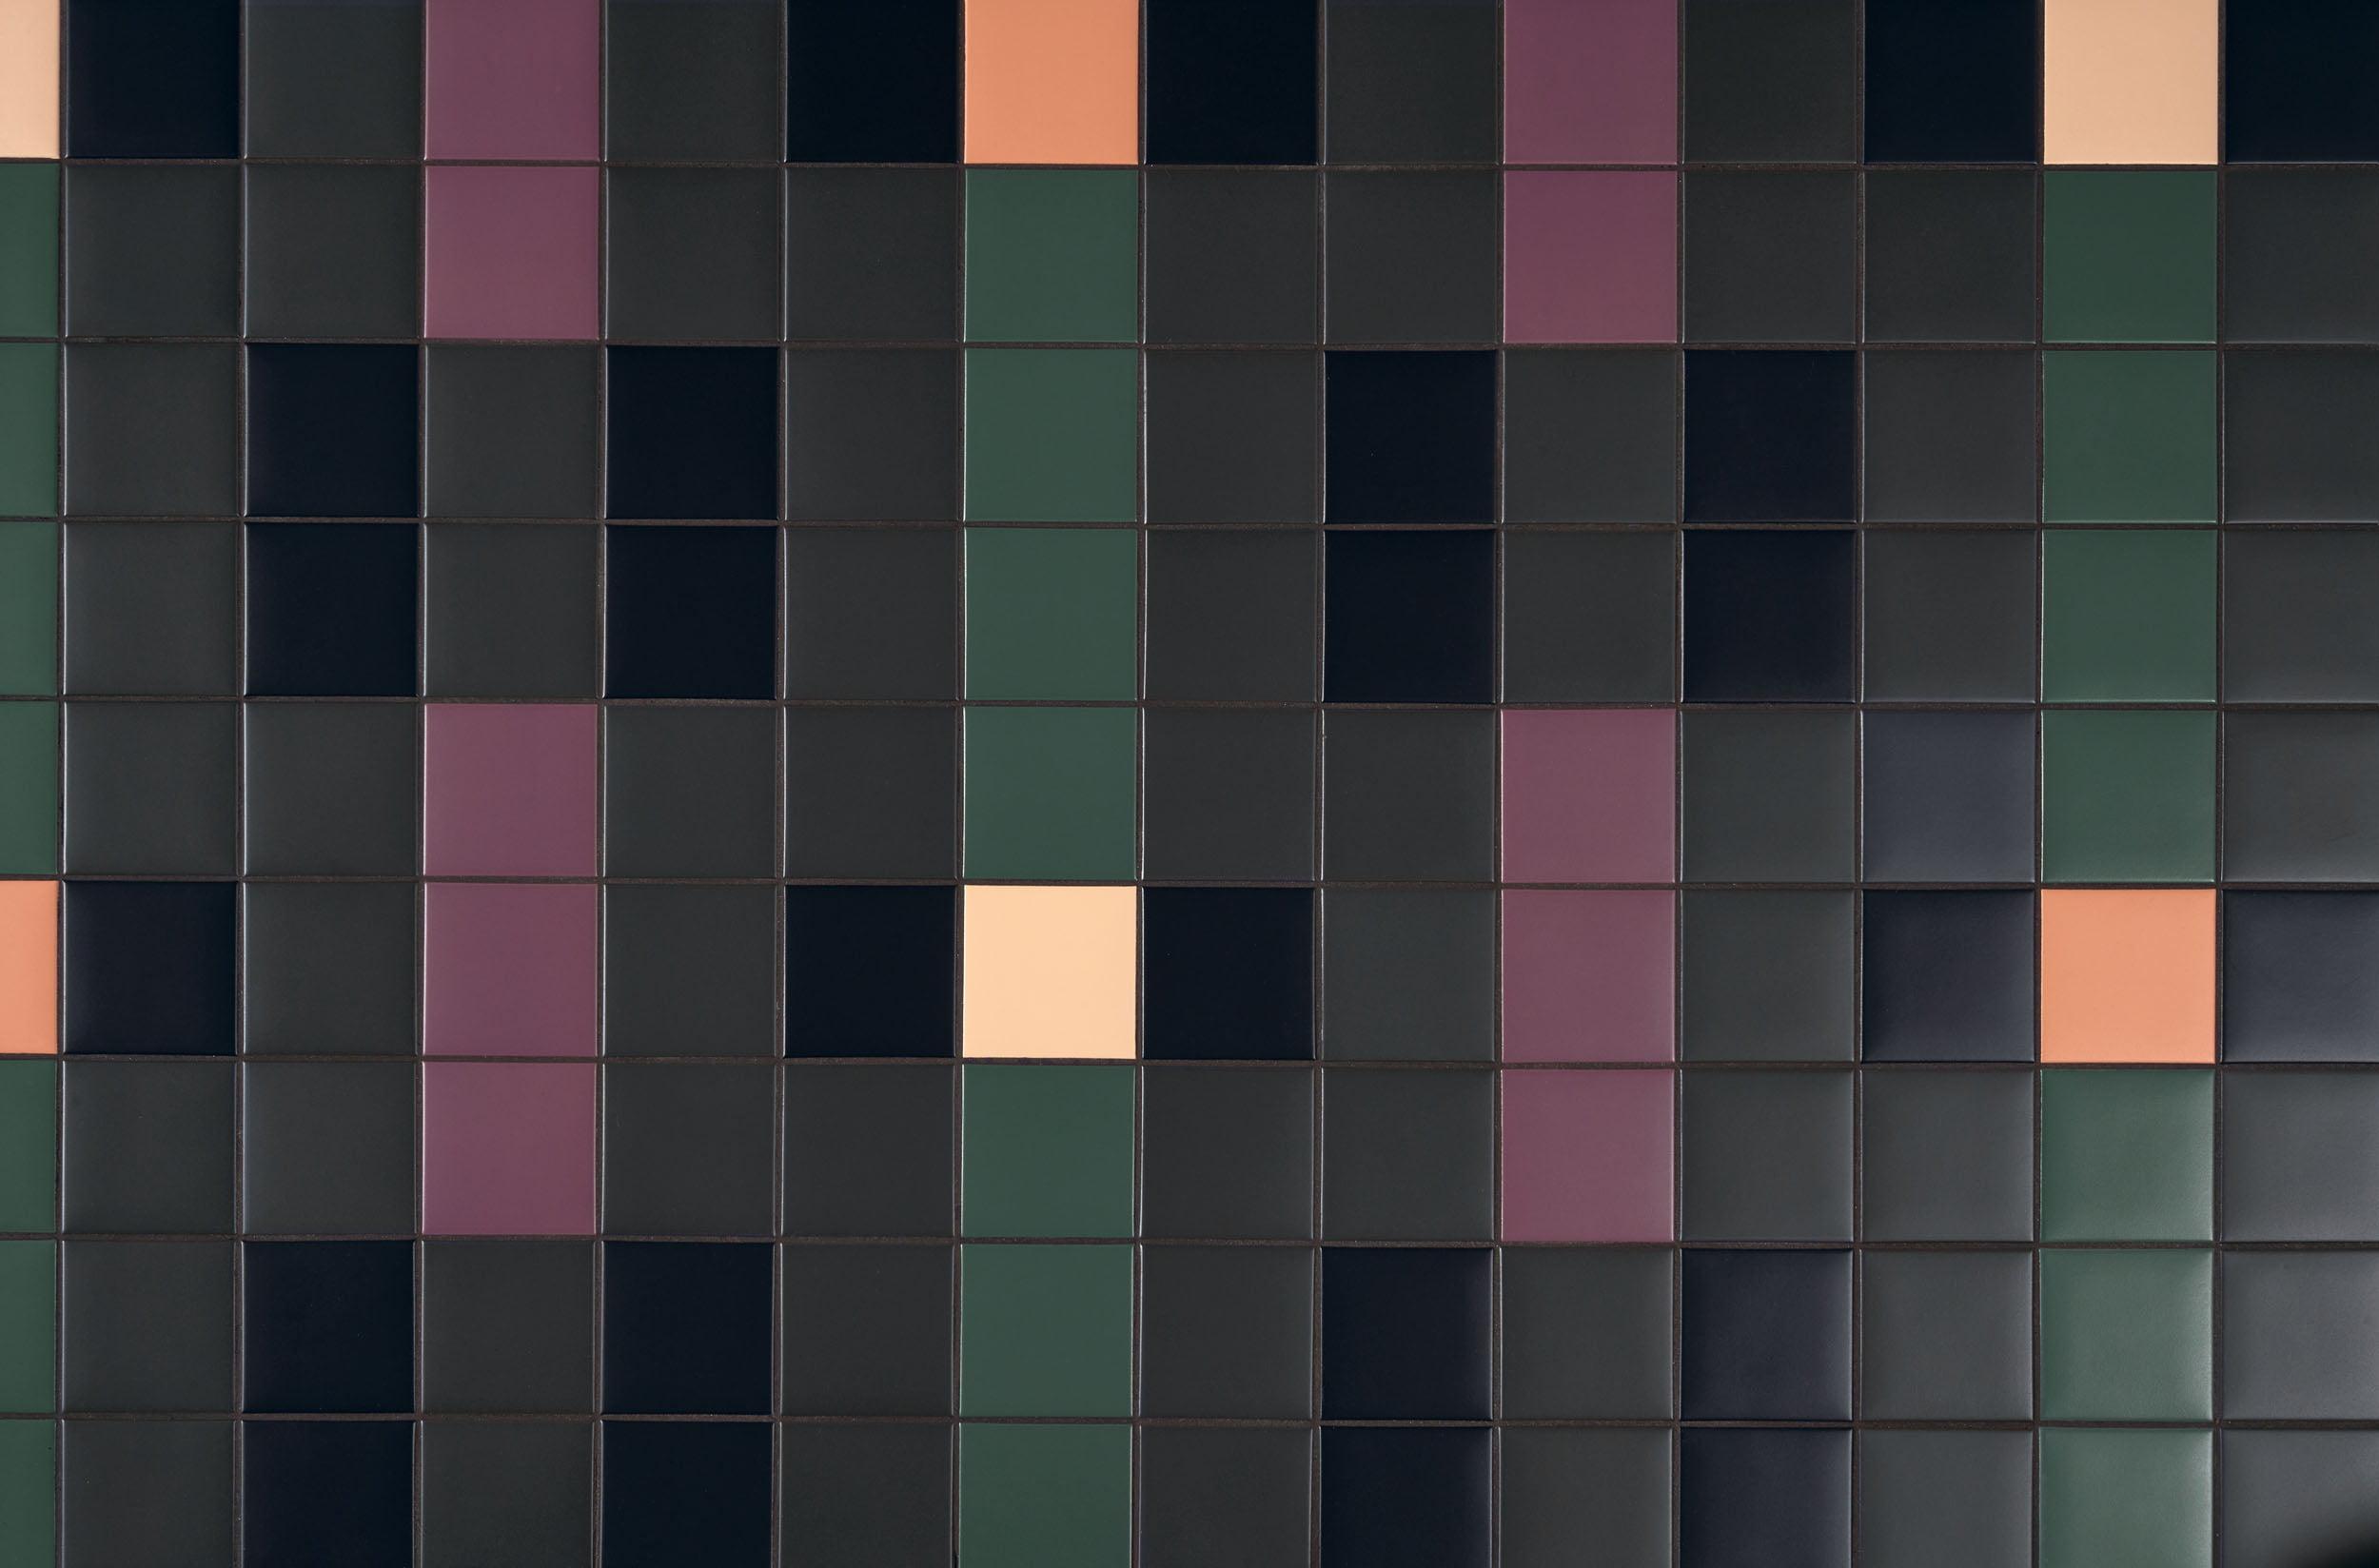 "Pixel41 11,55x11,55 5""x5"", 06 Violet - 09 Blush - 11 Powder - 25 Black - 26 Antrax - 37 Military"